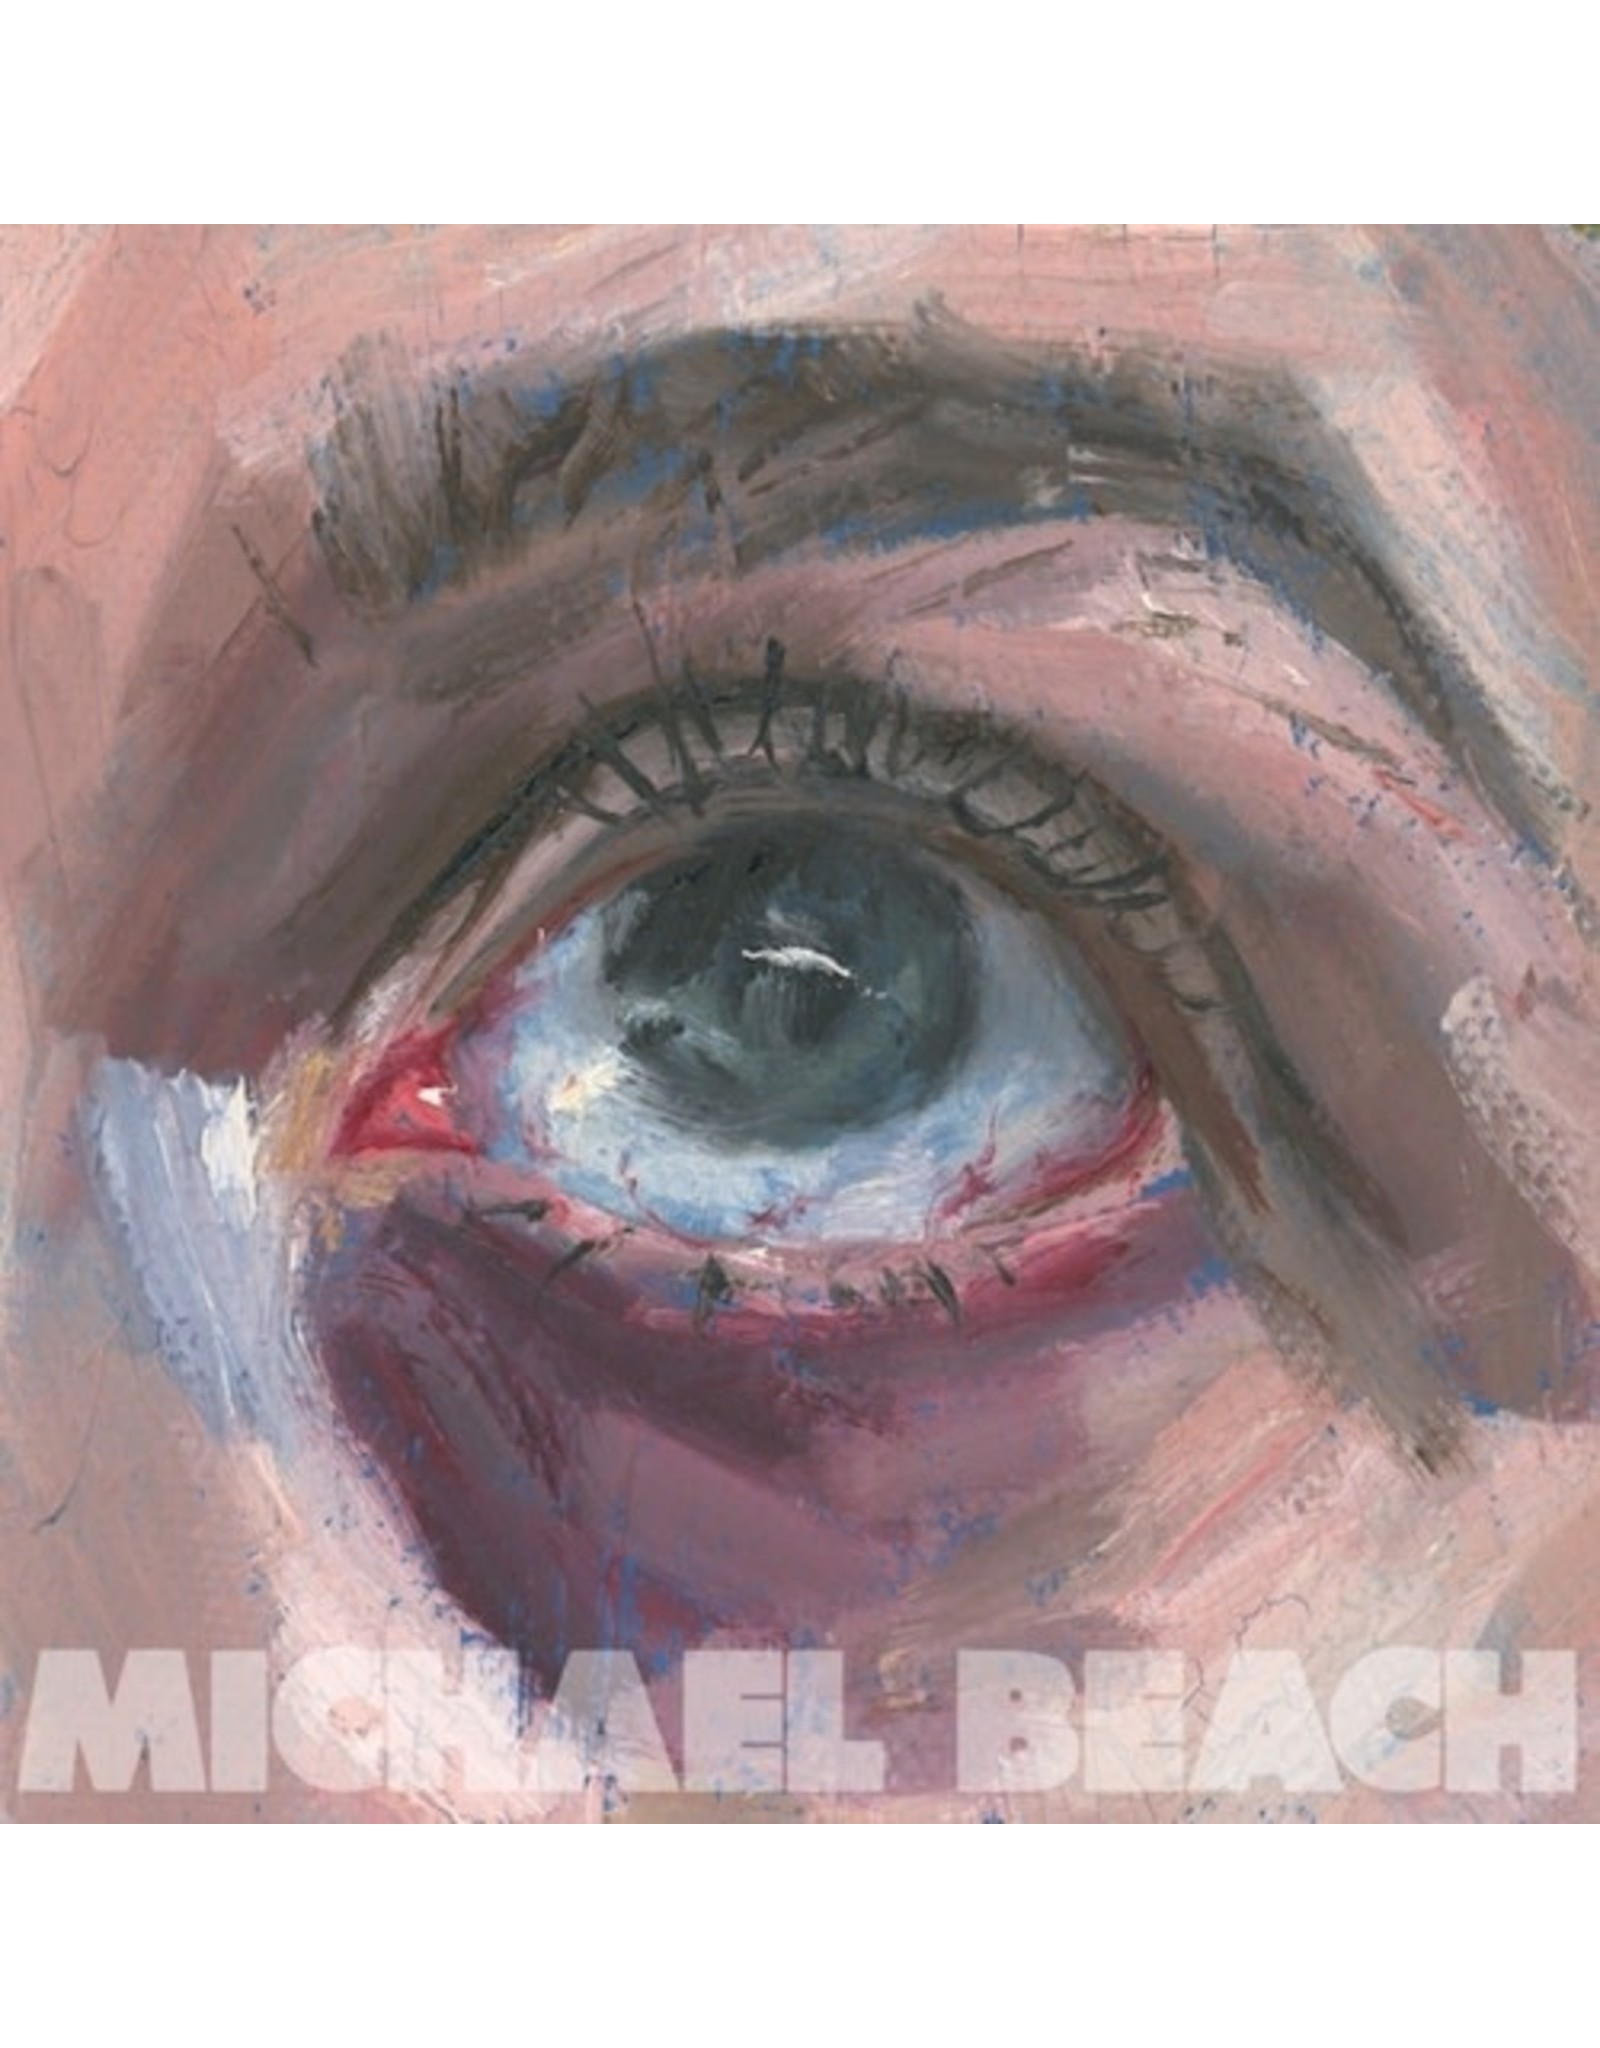 Goner Beach, Michael: Dream Violence (coloured)  LP